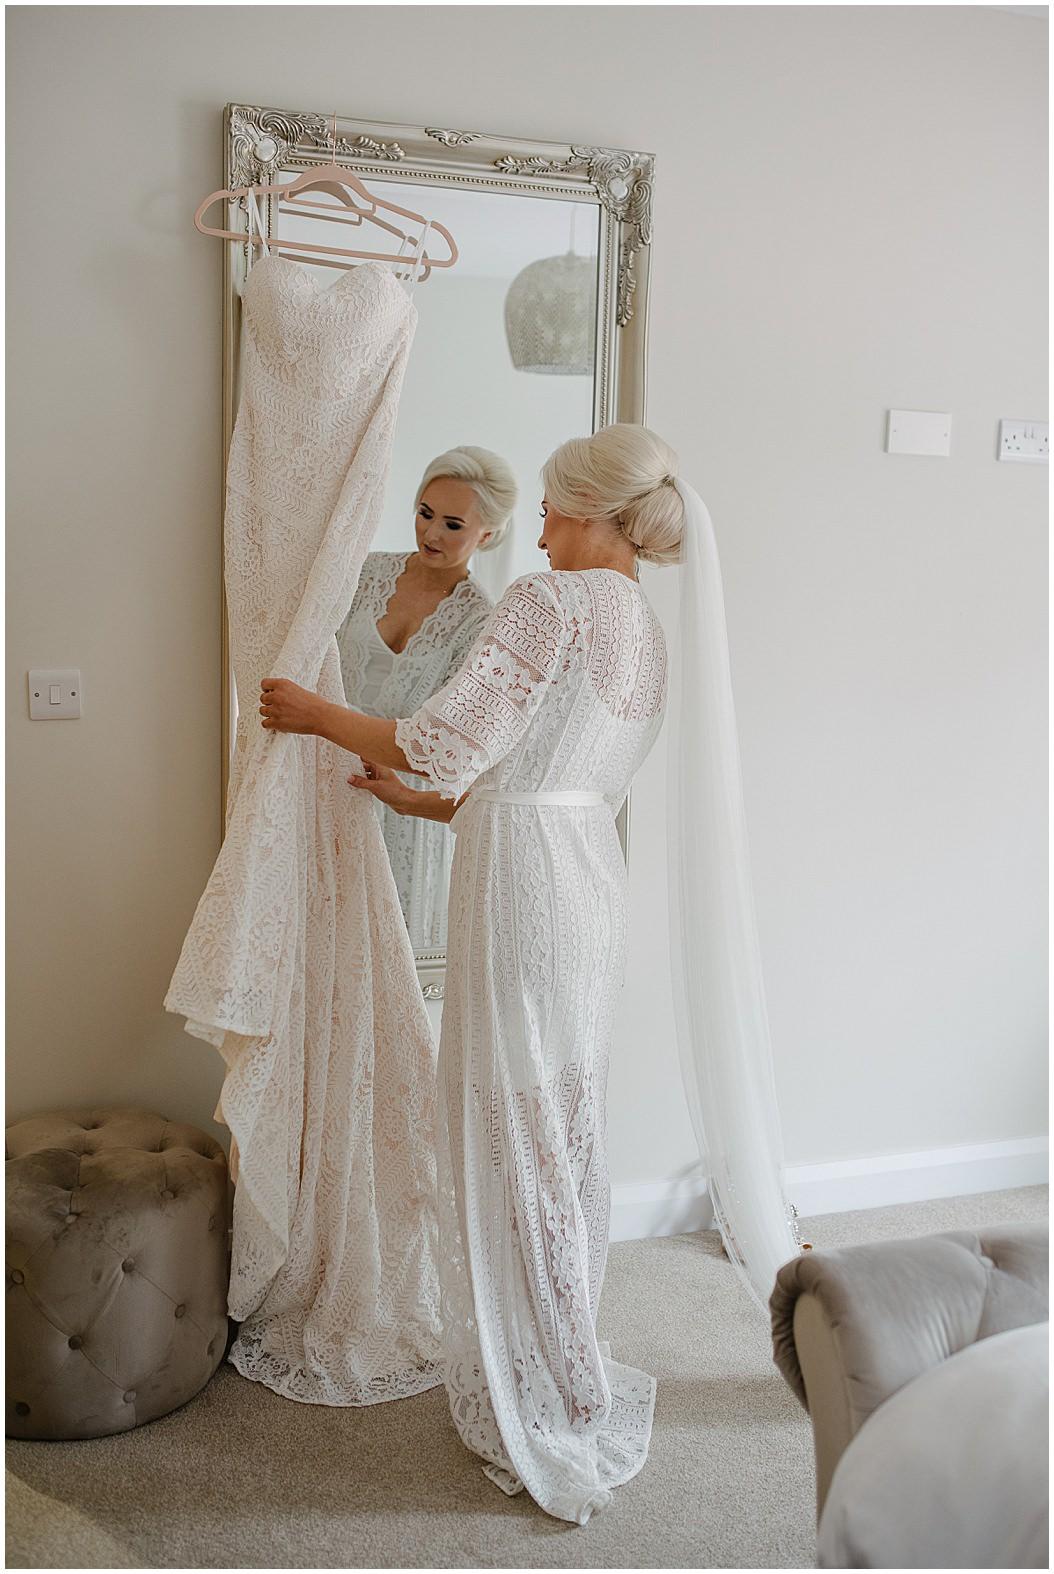 tempo-manor-wedding-jude-browne-photography_0002.jpg